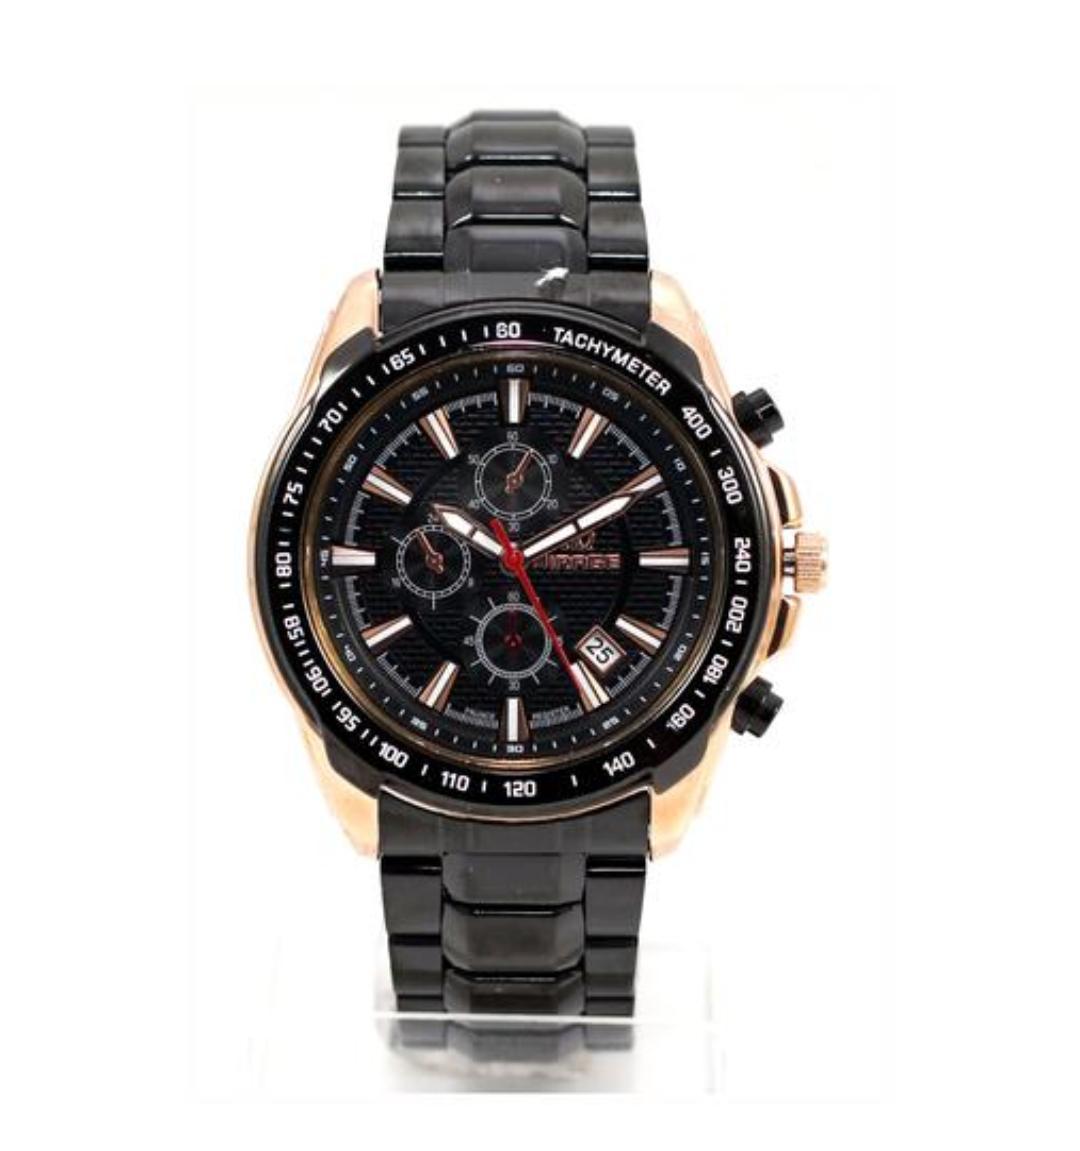 Jam Tangan Pria MIRAGE ORIGINAL 8305 BRP-M